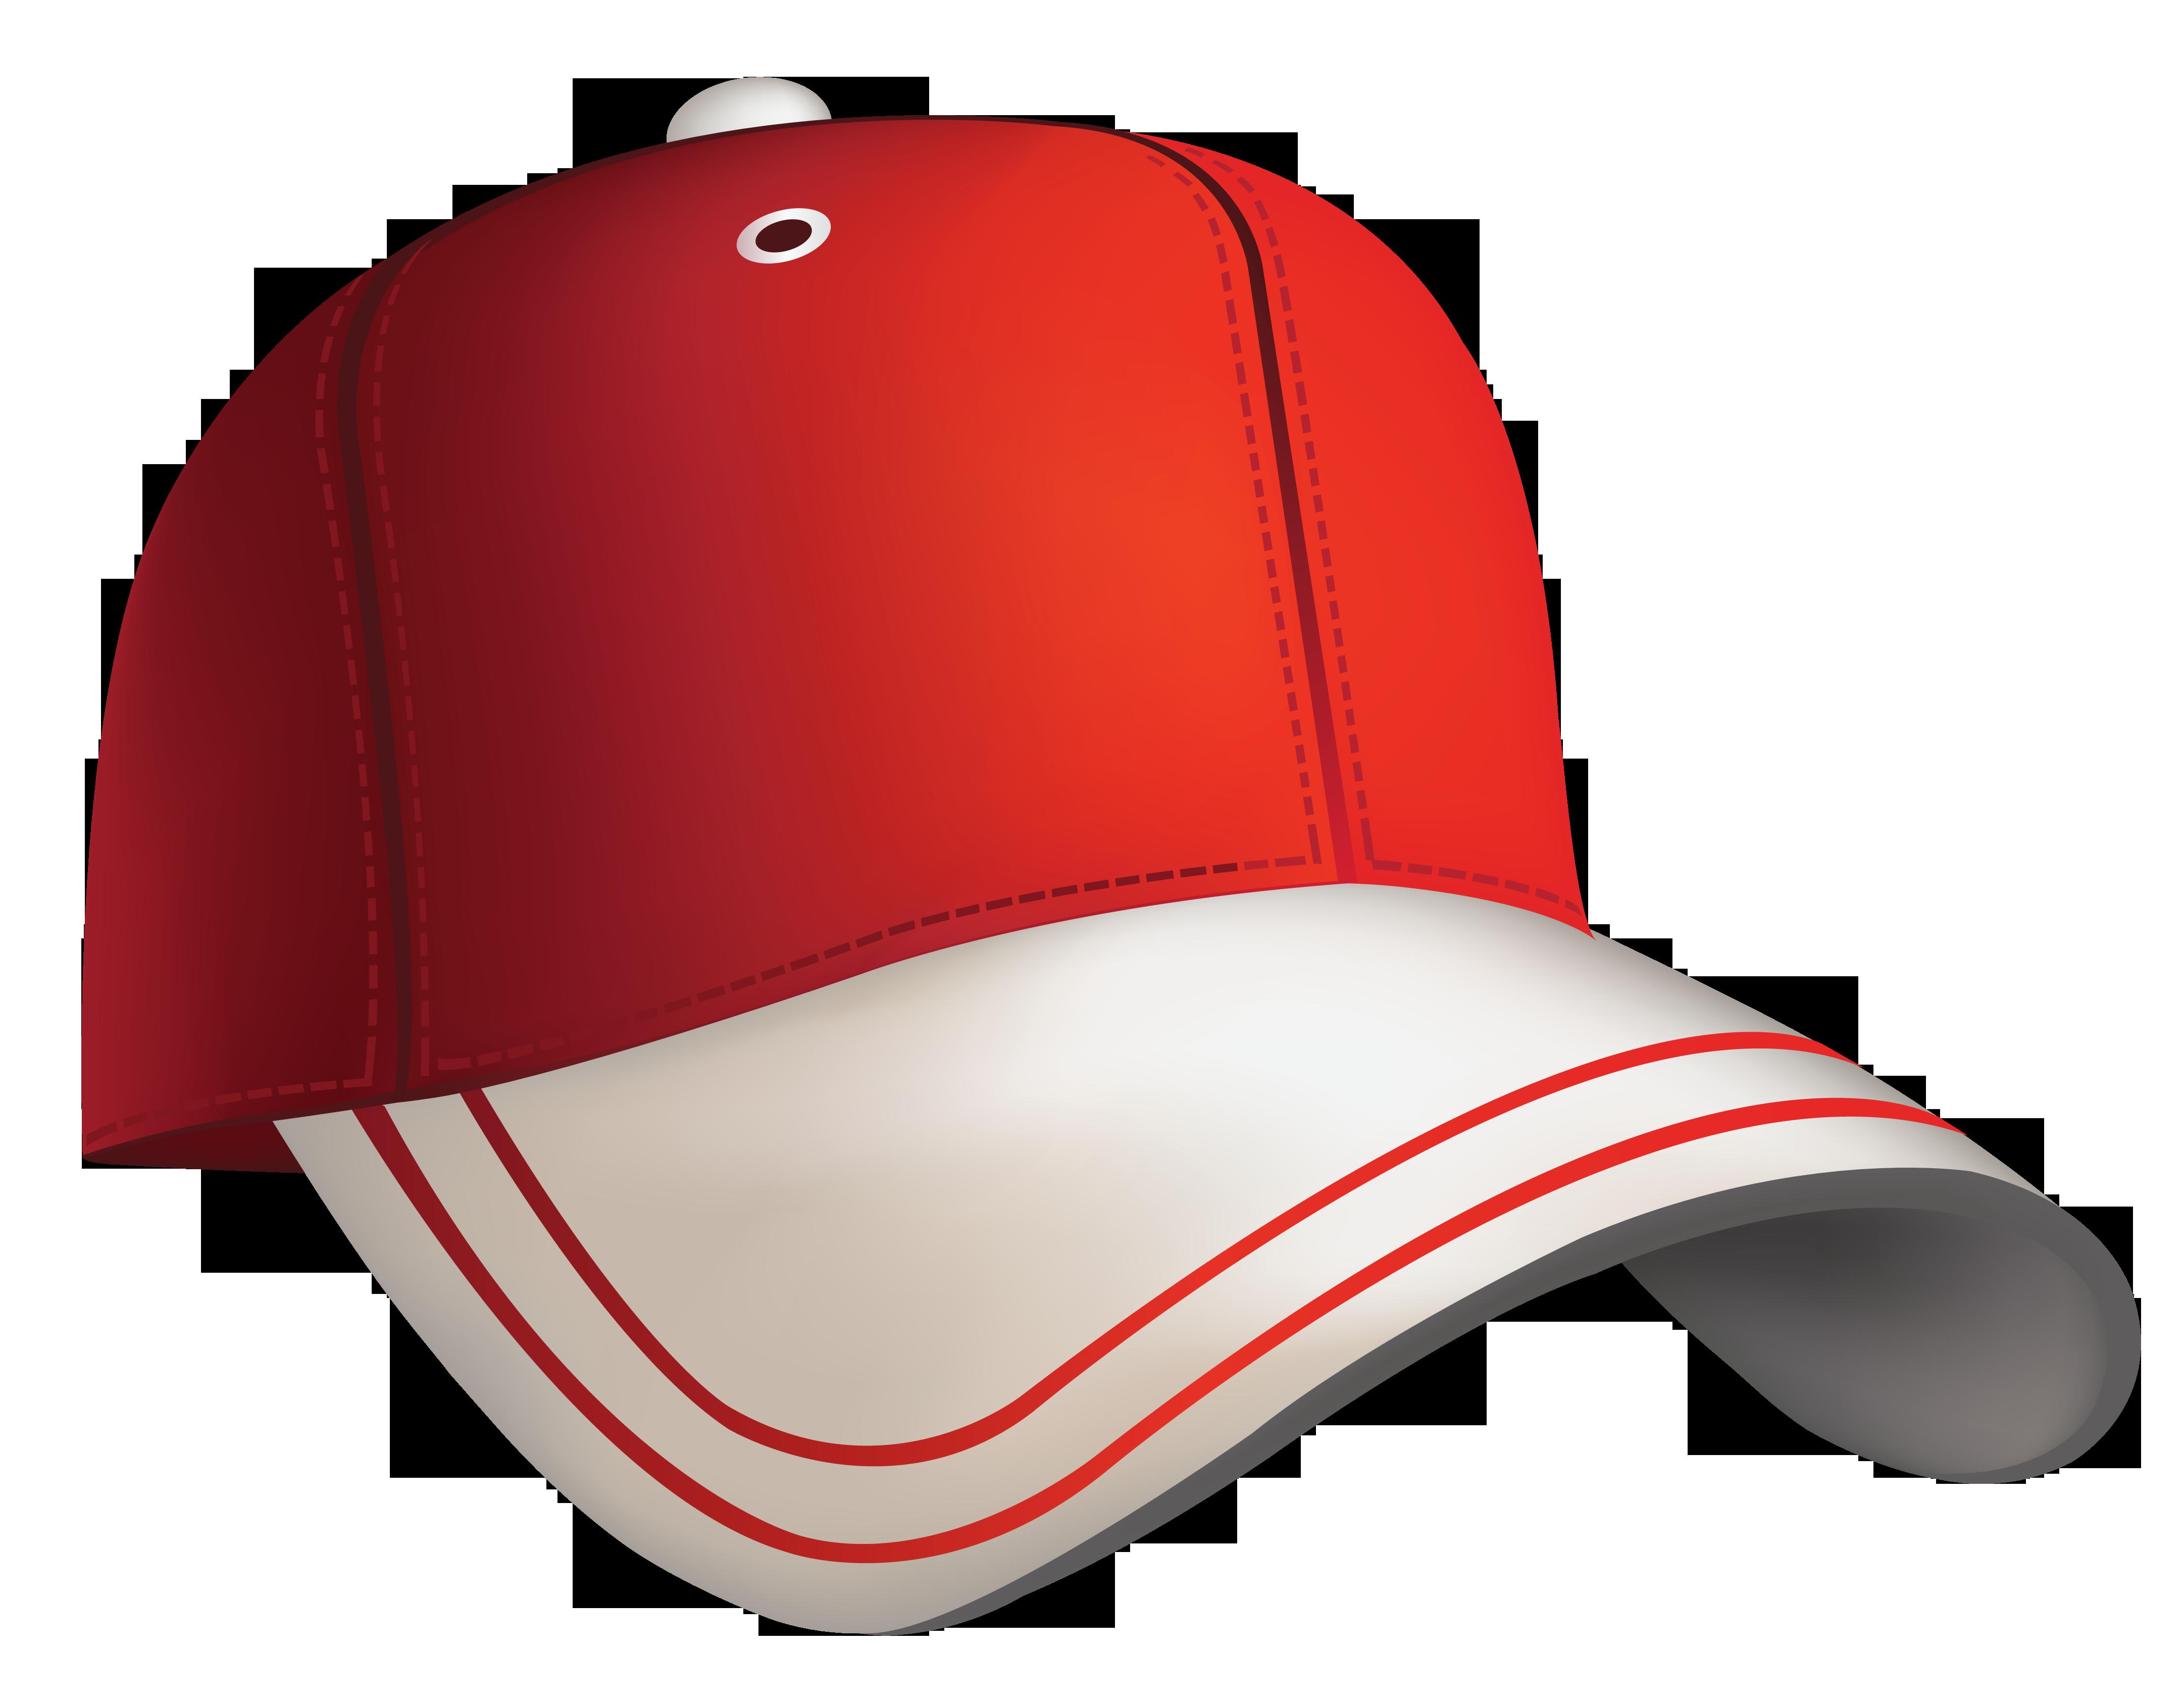 Baseball hat baseball cap clipart 3